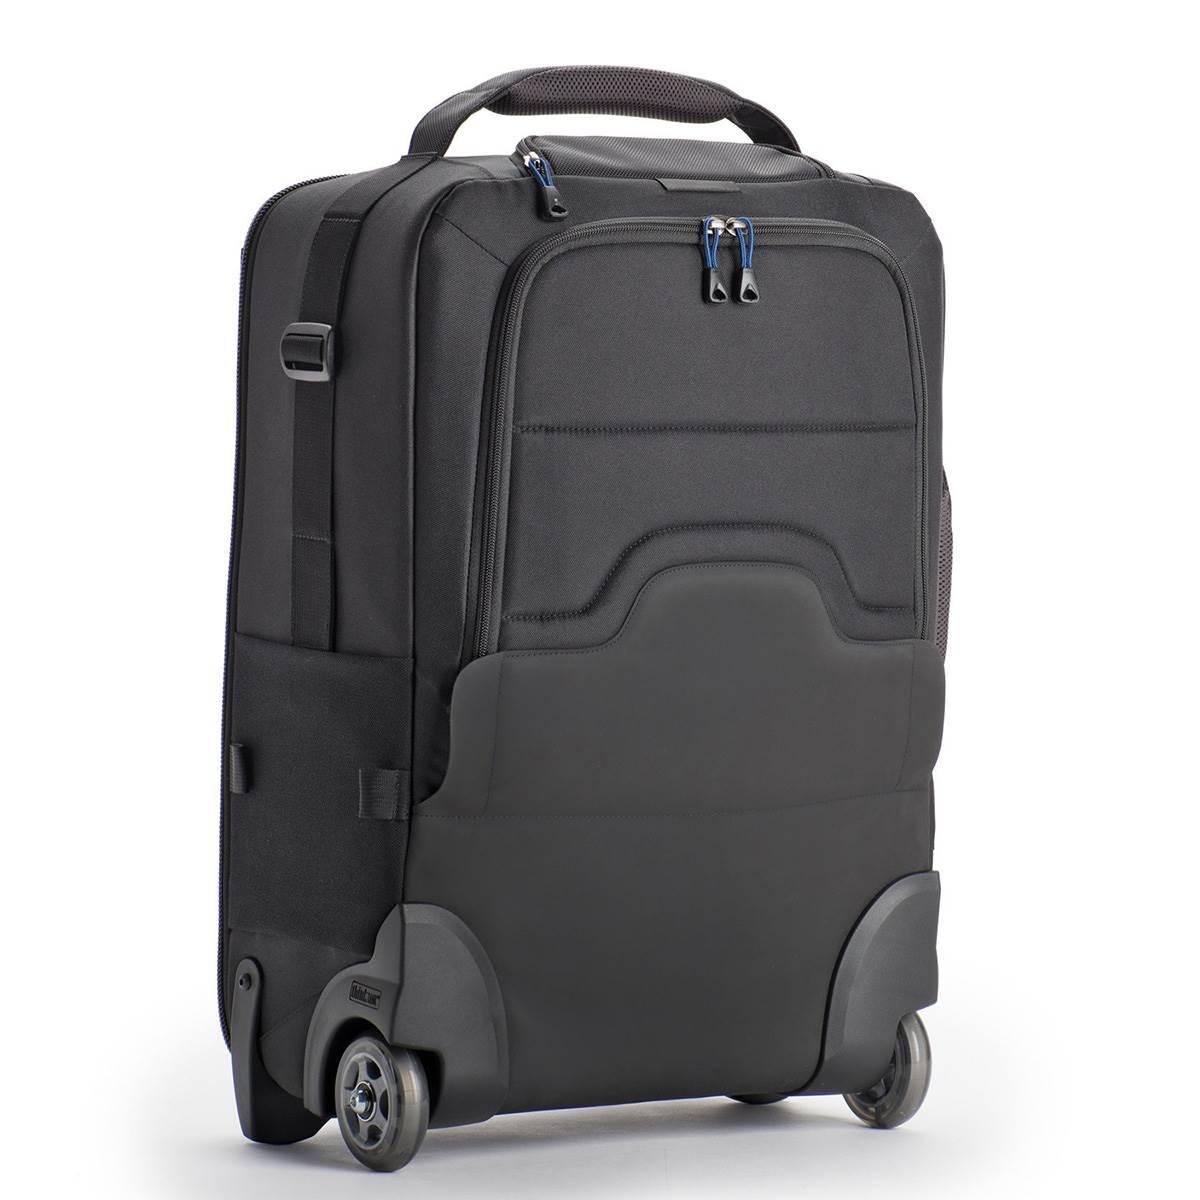 think tank valise roulettes airport takeoff v2 0 prophot. Black Bedroom Furniture Sets. Home Design Ideas